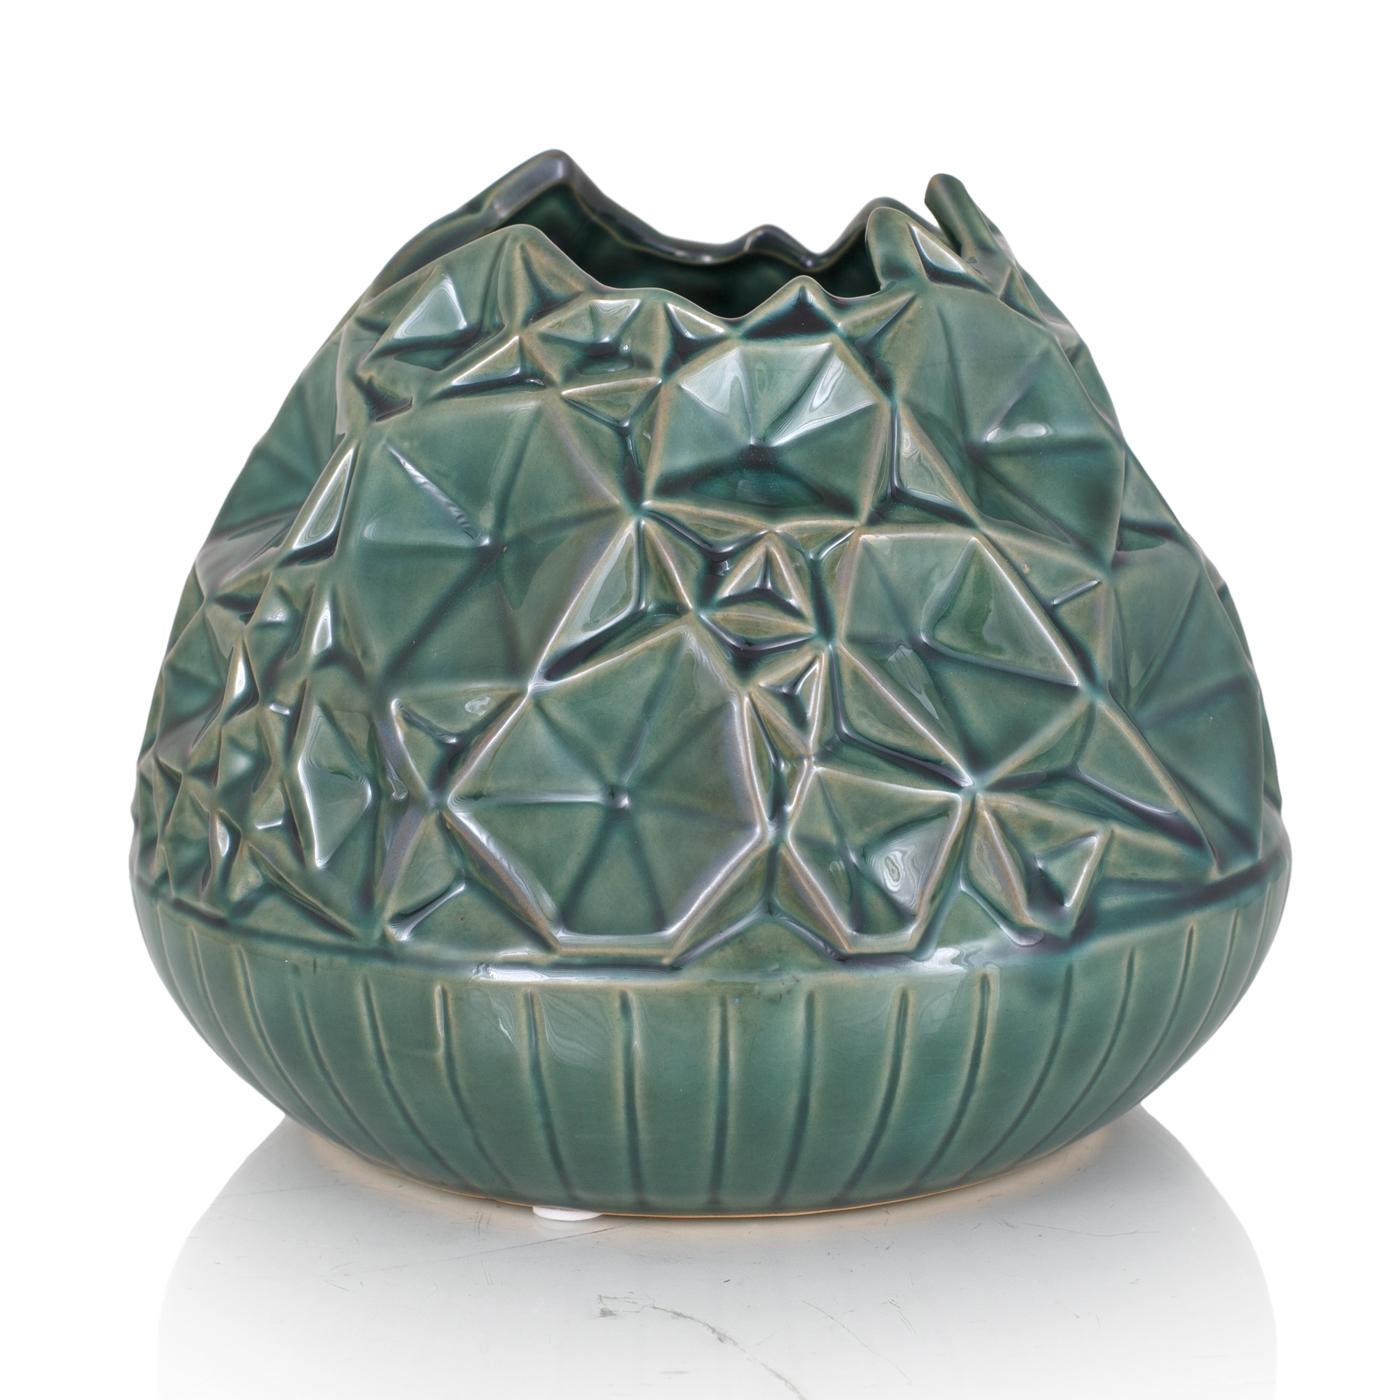 {} Home Philosophy Ваза Carina (18х18 см) ваза керамика розовый рассвет 18 12 8 5 см 863622